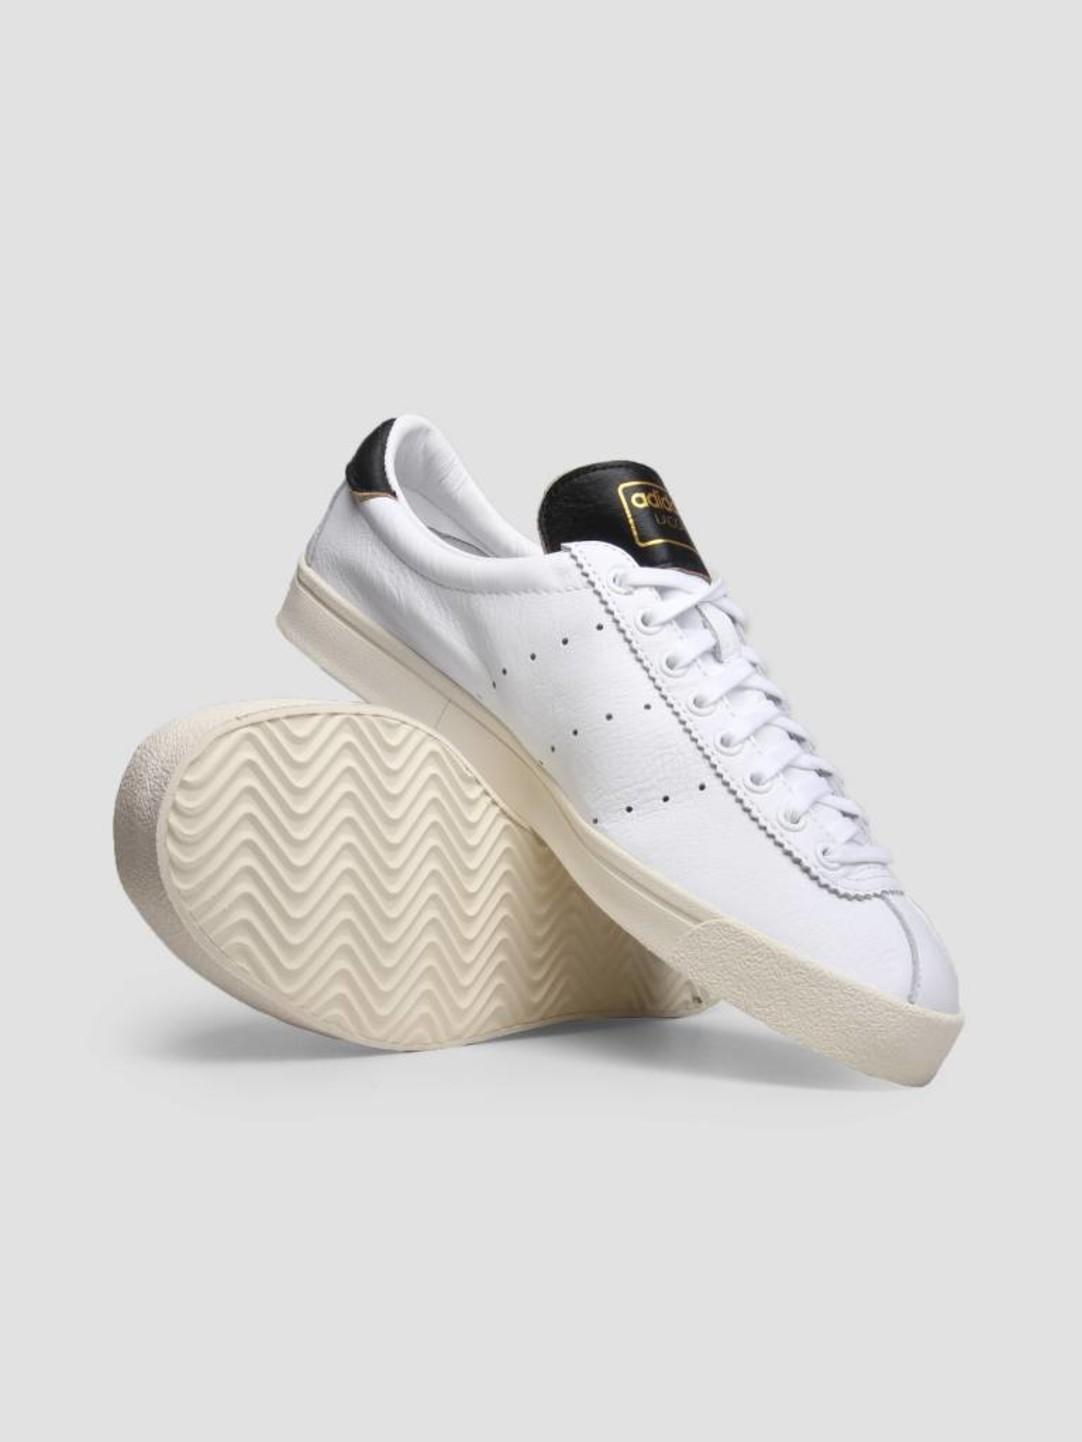 adidas adidas Lacombe Ftwwht Cblack Cwhite DB3013